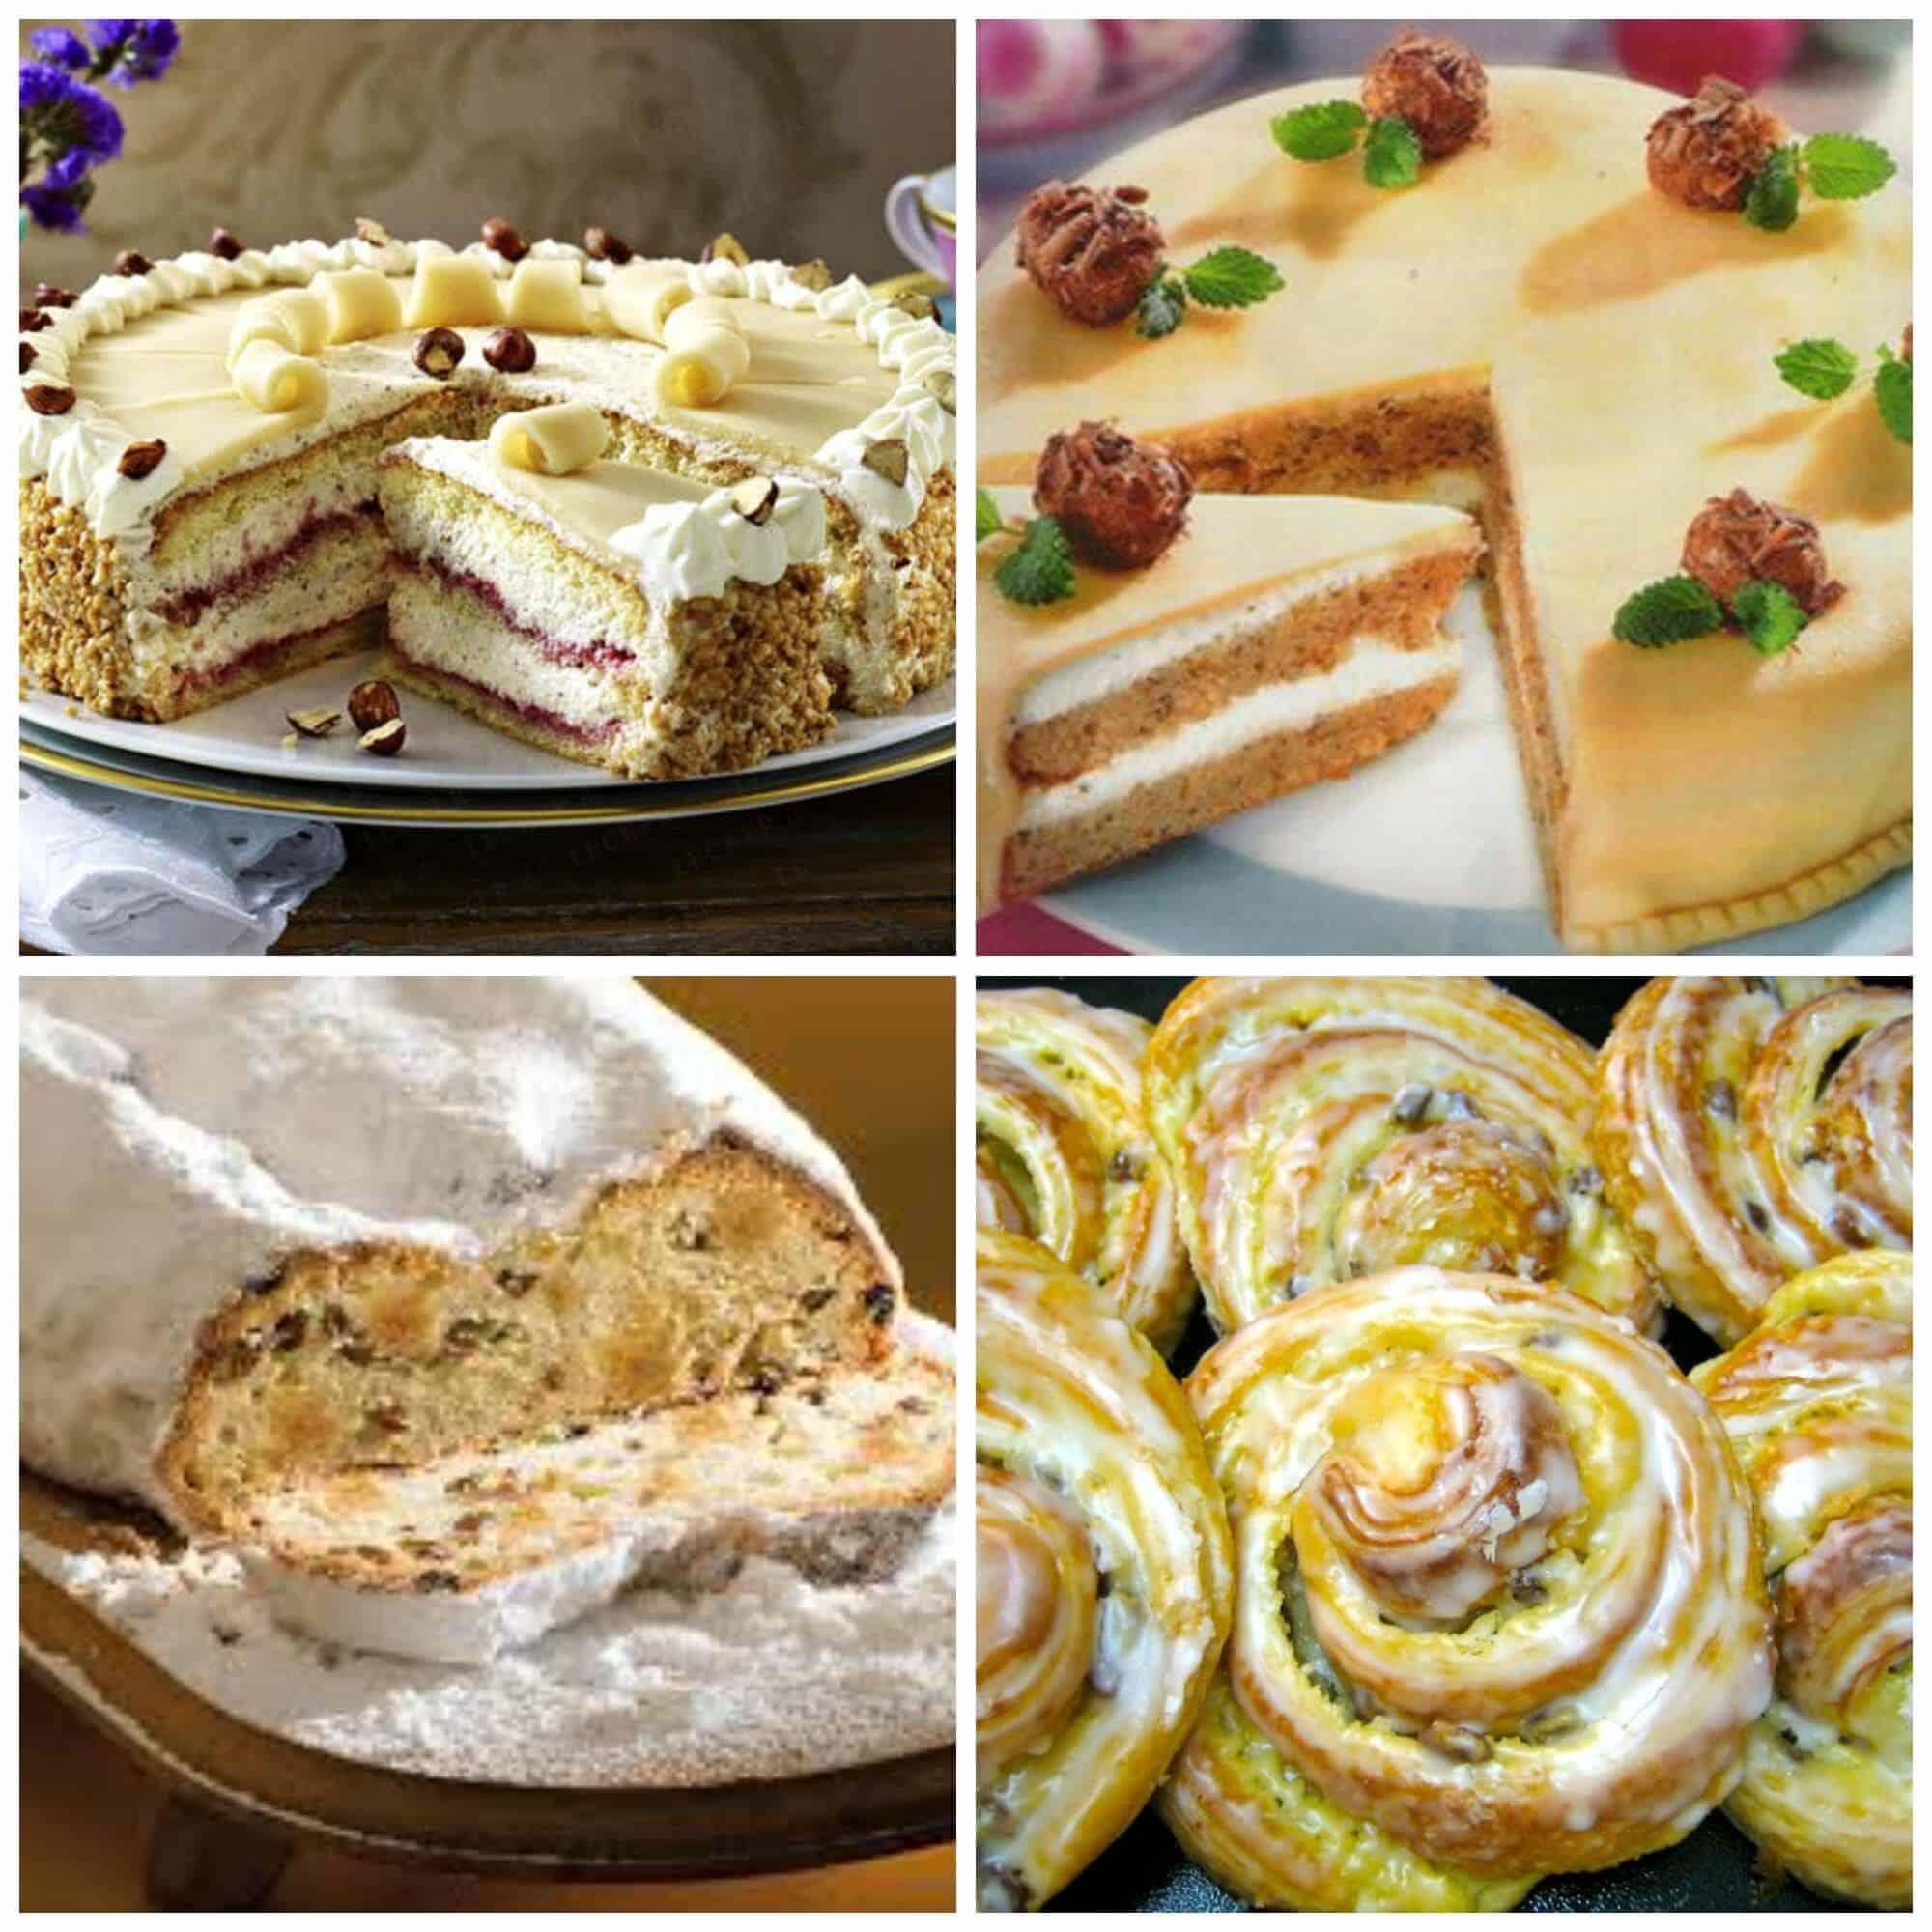 Marzipan Baked Goods